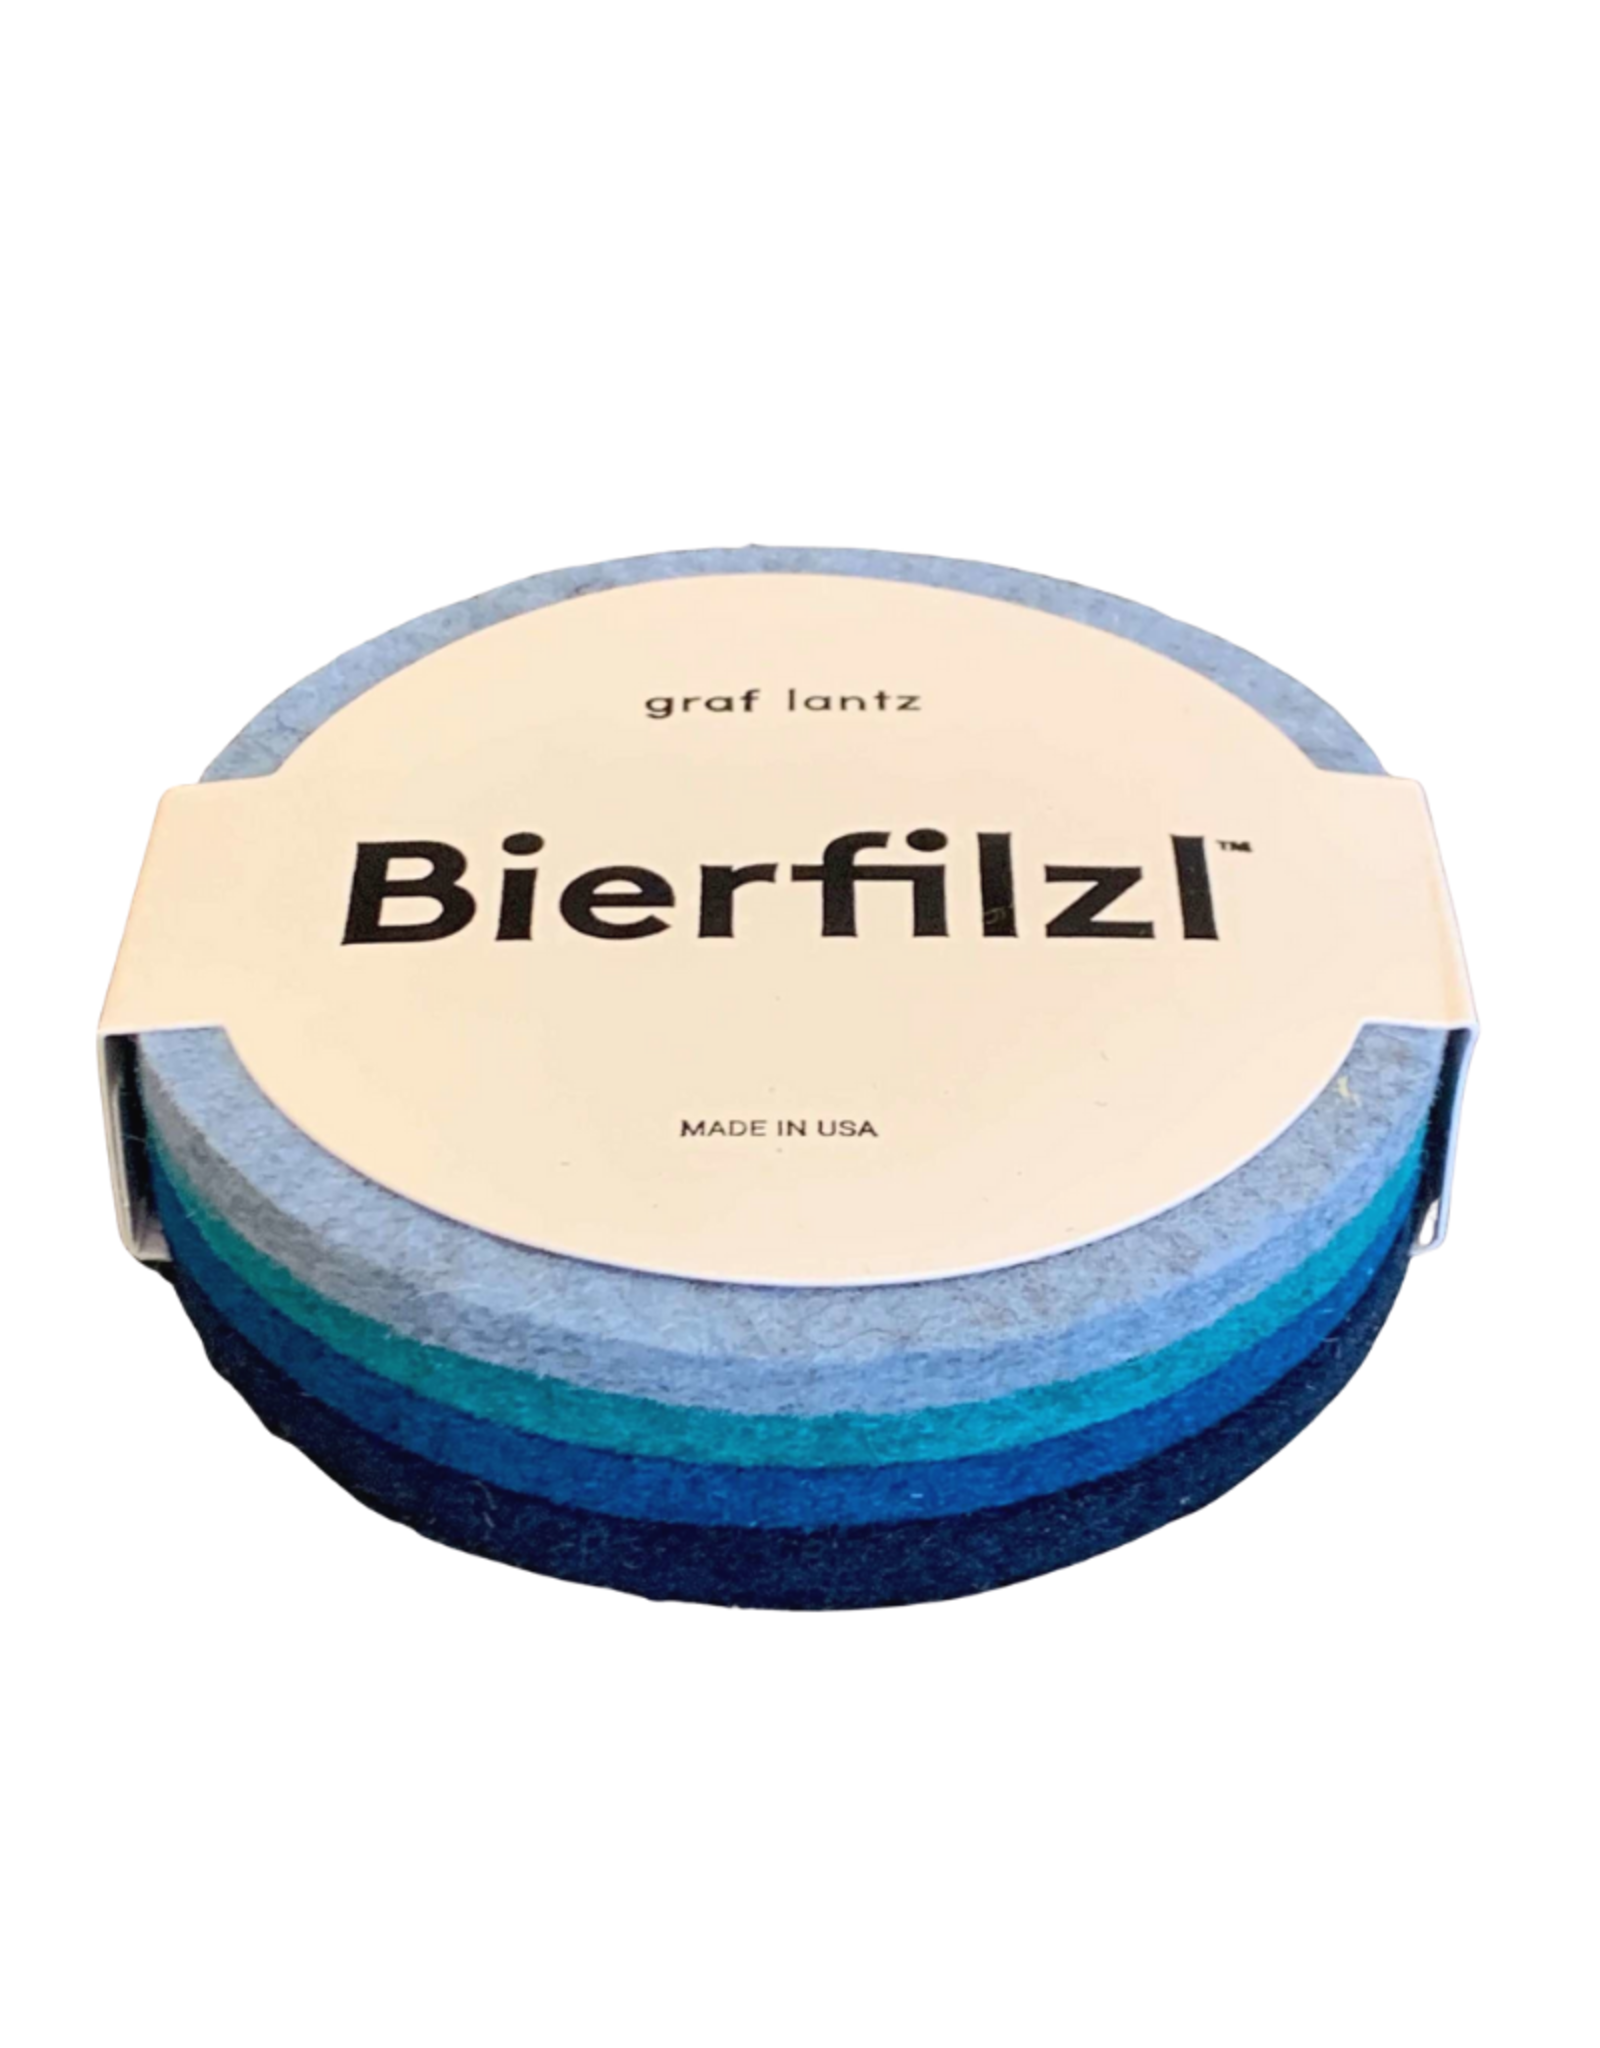 Graf&Lantz Bierfilzl Round Felt Coaster 4 Pack - Ocean